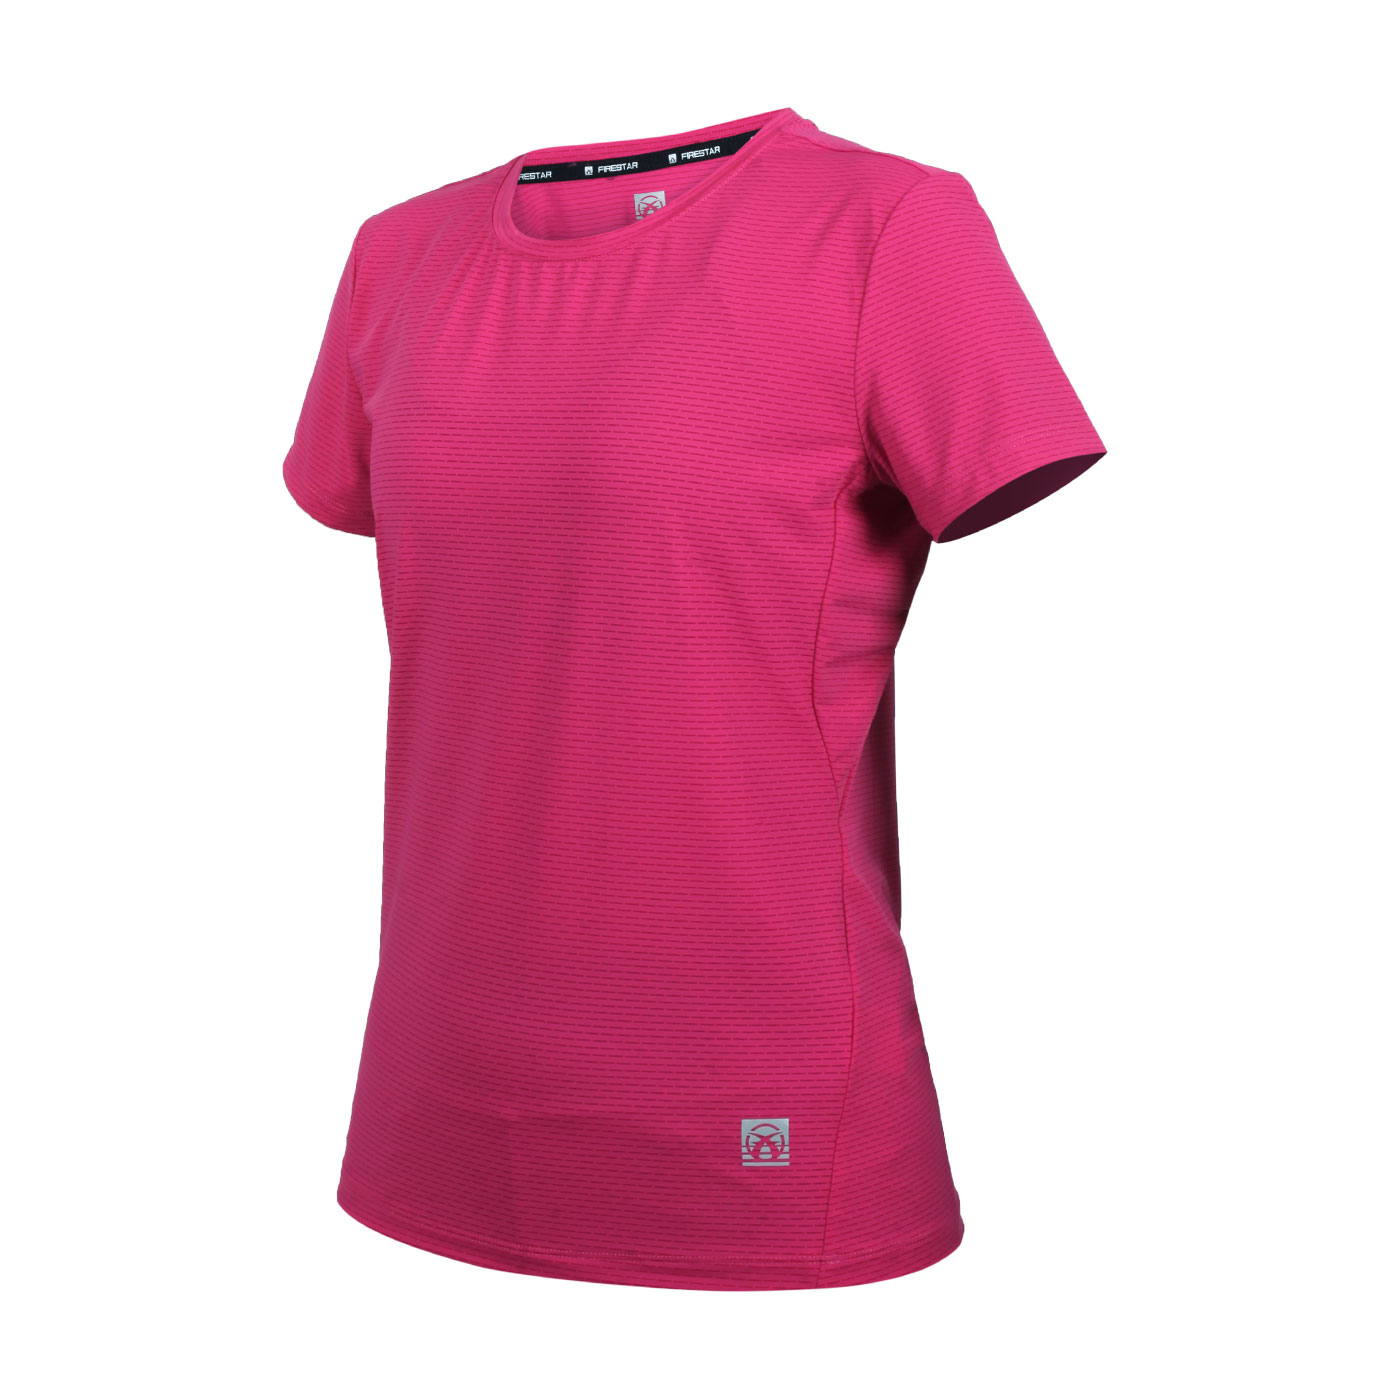 FIRESTAR 女款彈性機能圓領短袖T恤 DL161-47 - 桃紅